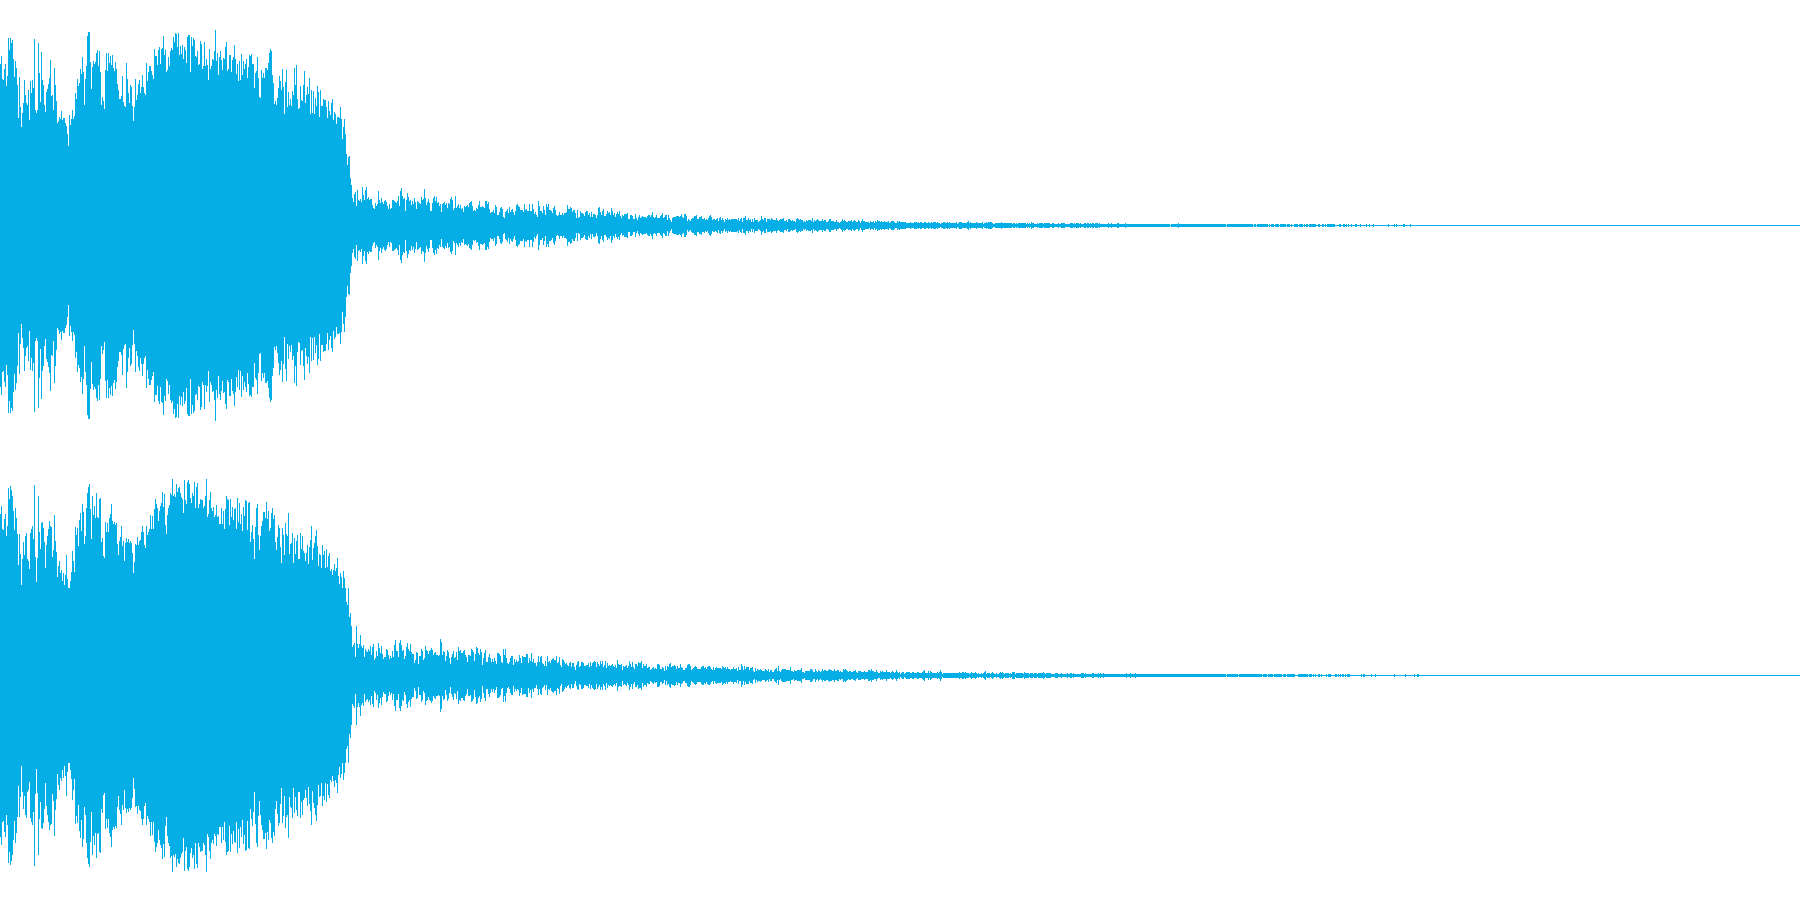 DJFX ヒットチャート発表前SE 30の再生済みの波形